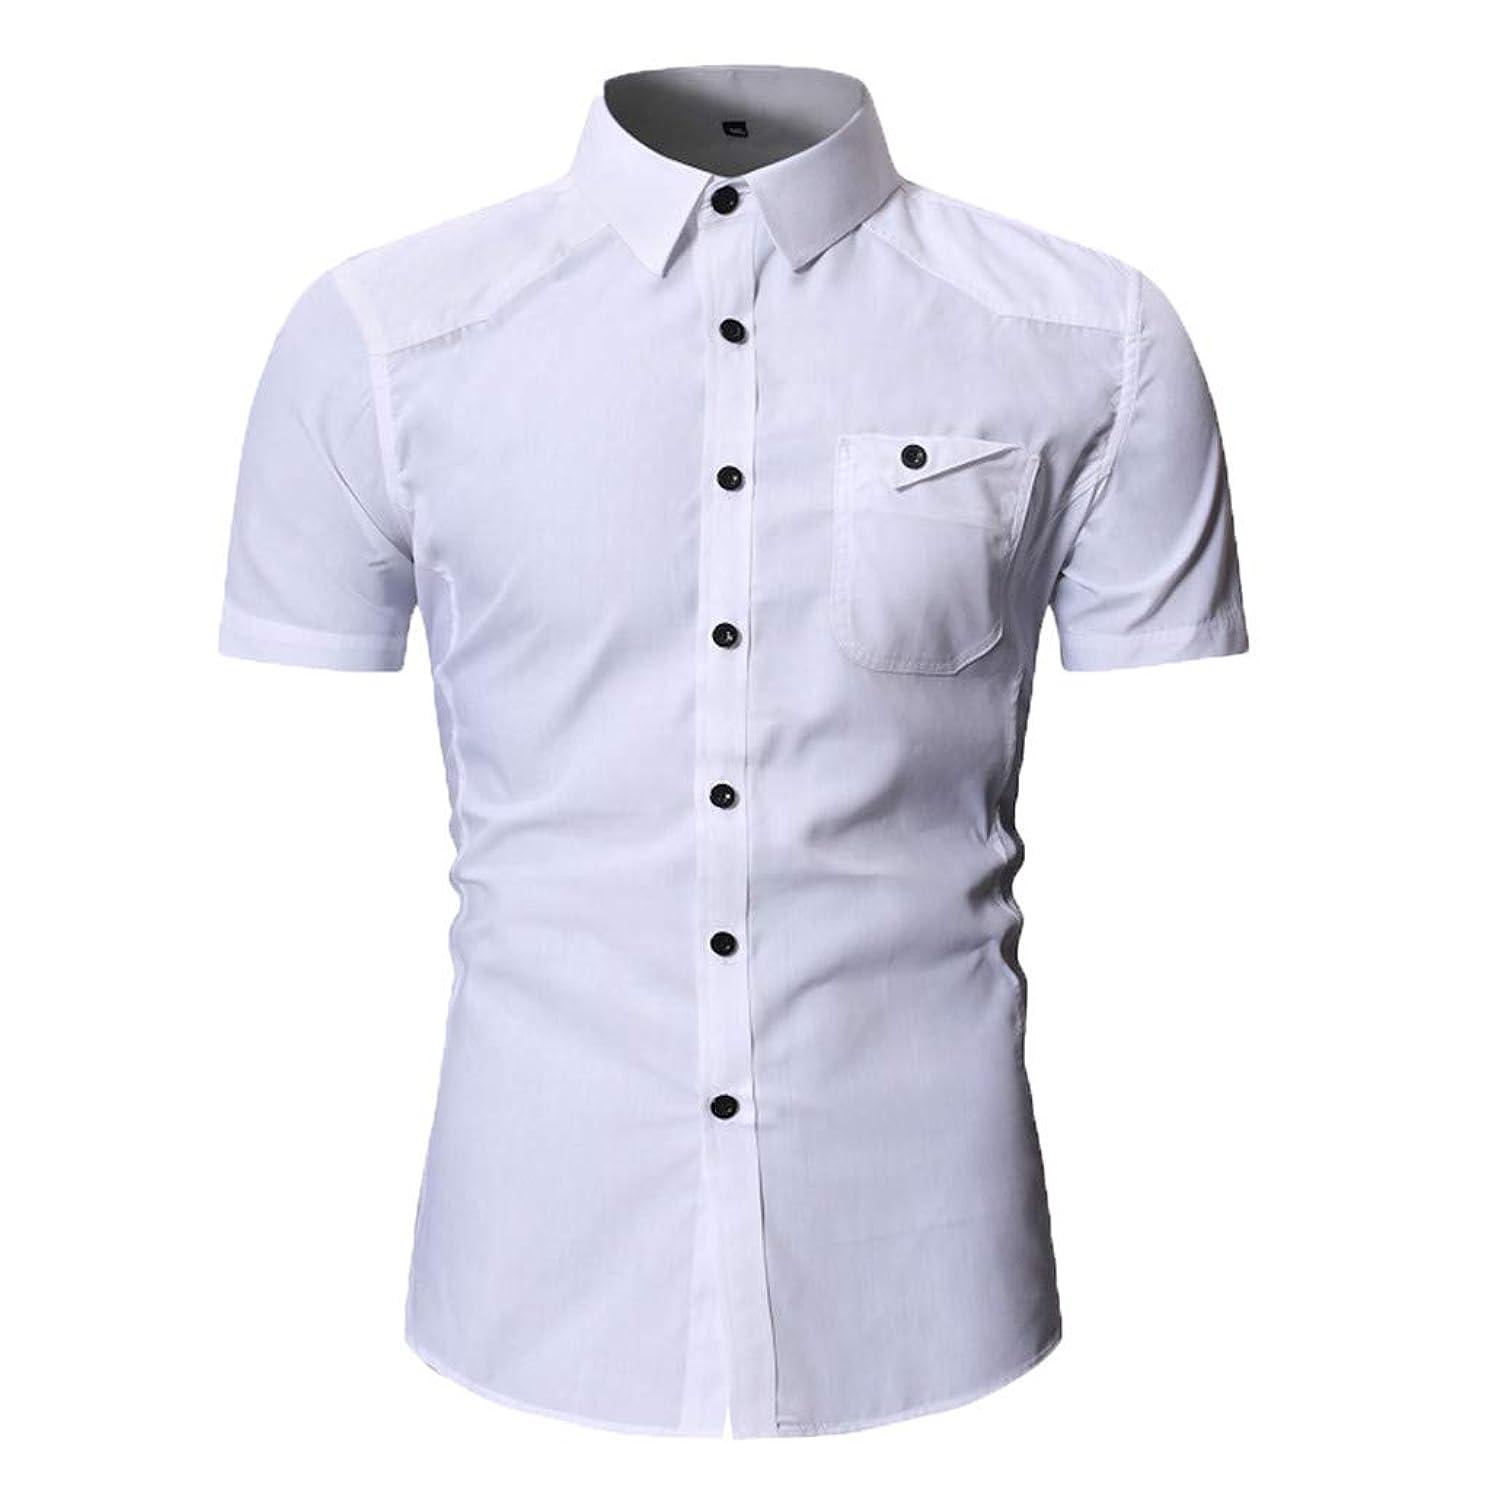 JJLIKER Men's Standard-Fit Short-Sleeve Plain Shirts Button Down Casual Pocket Shirt Tops Slim-Fit Dress Shirt Tees